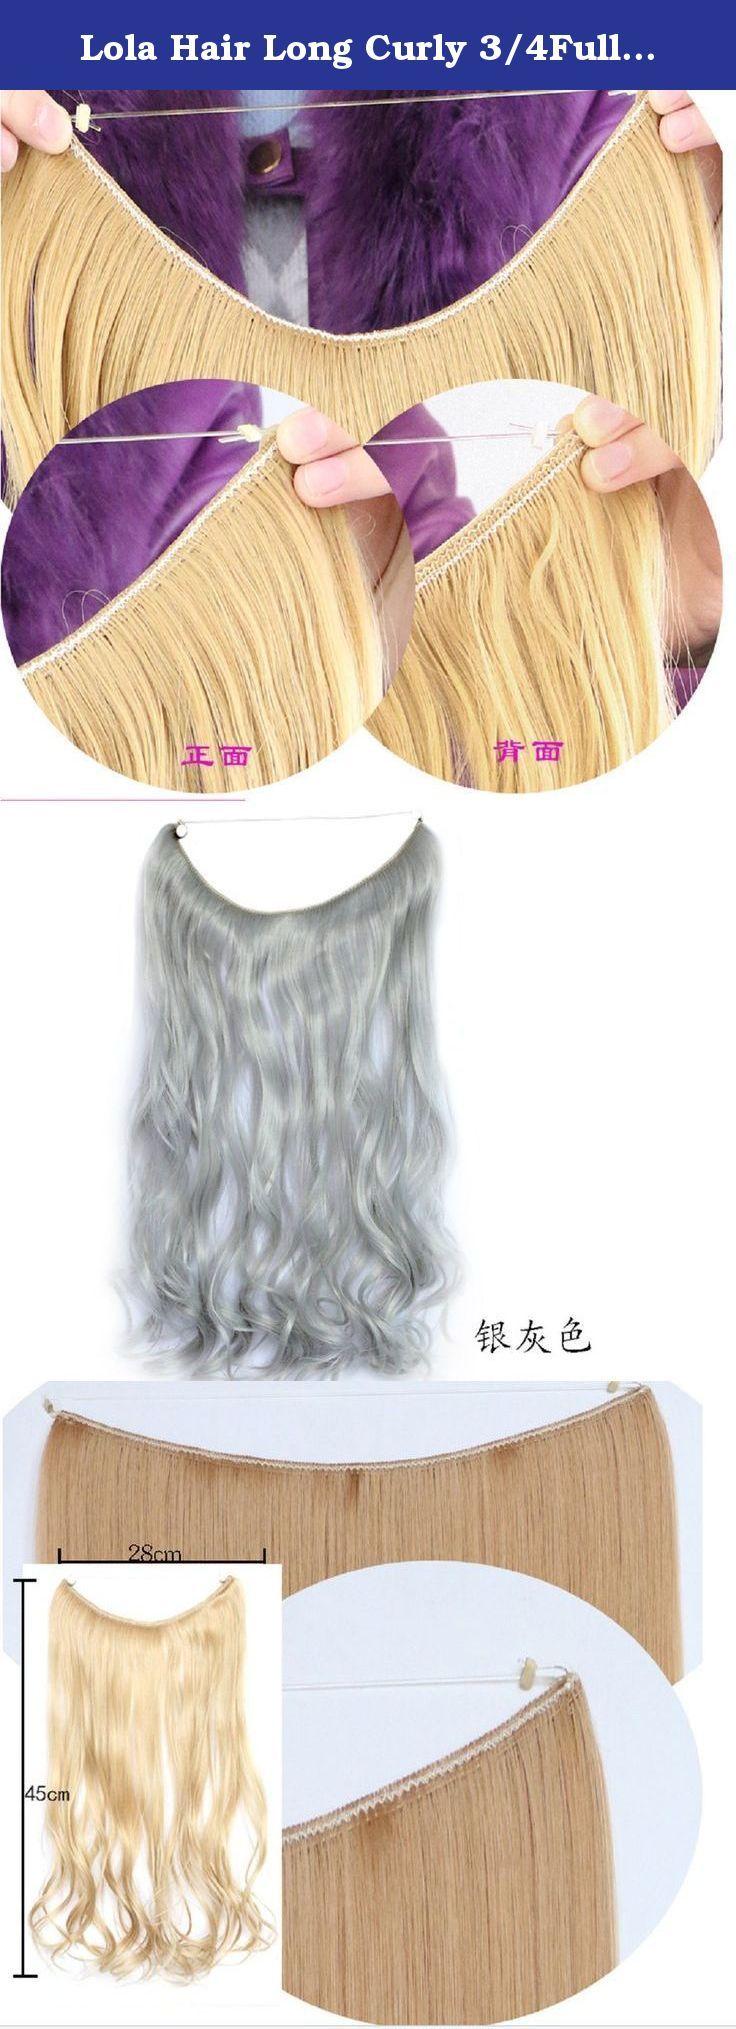 Lola Hair Long Curly 3 4Full Head Silver Gray Hair Extensions